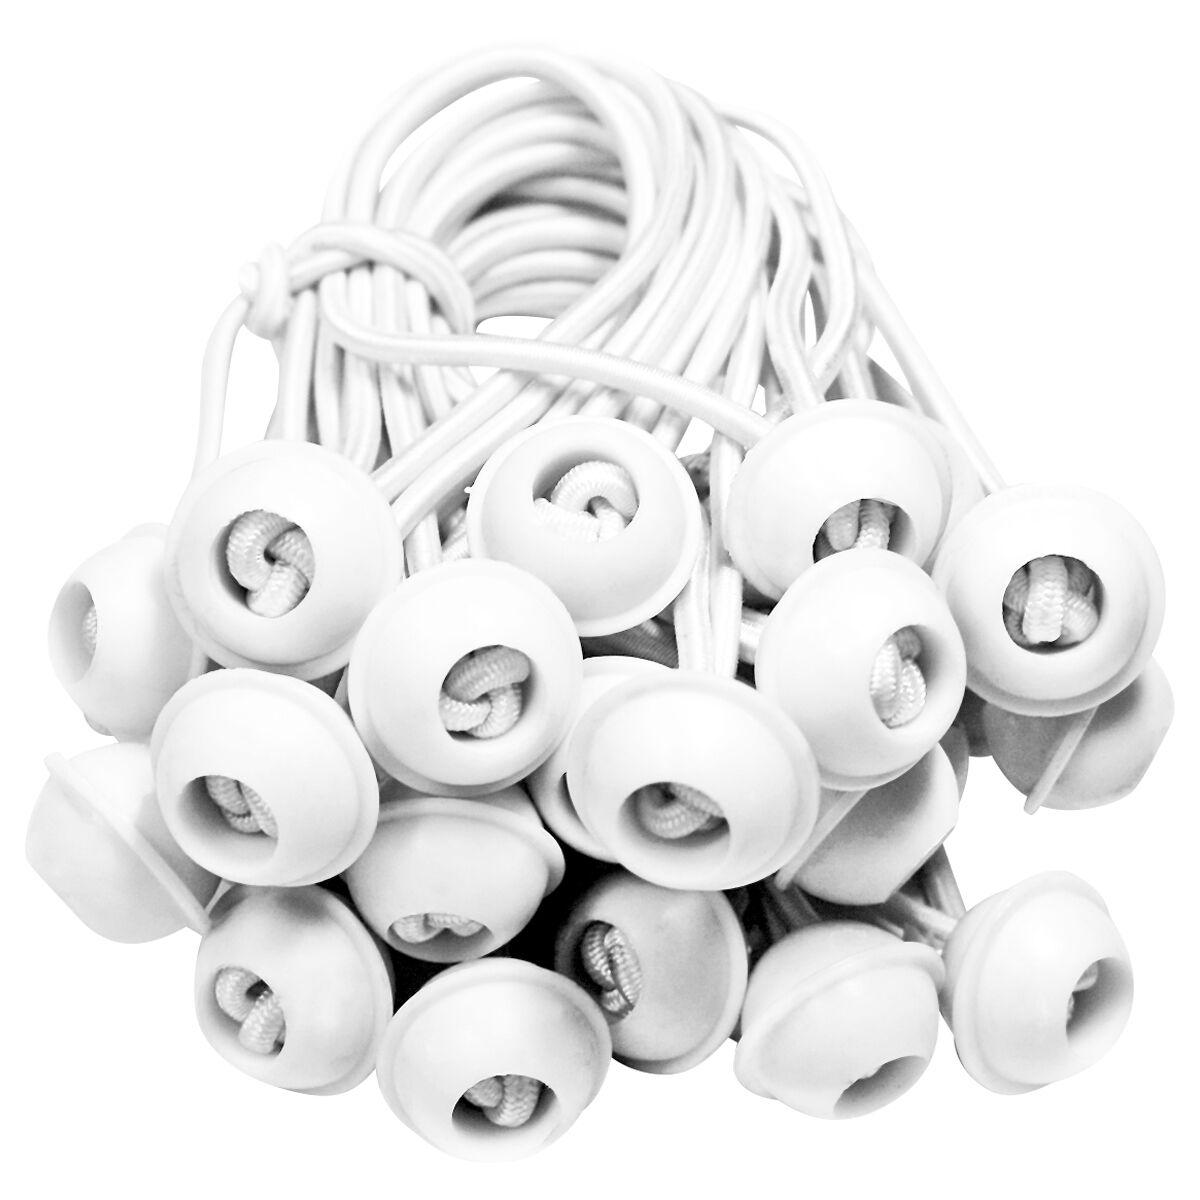 TOOLPORT Accessories Rubber white